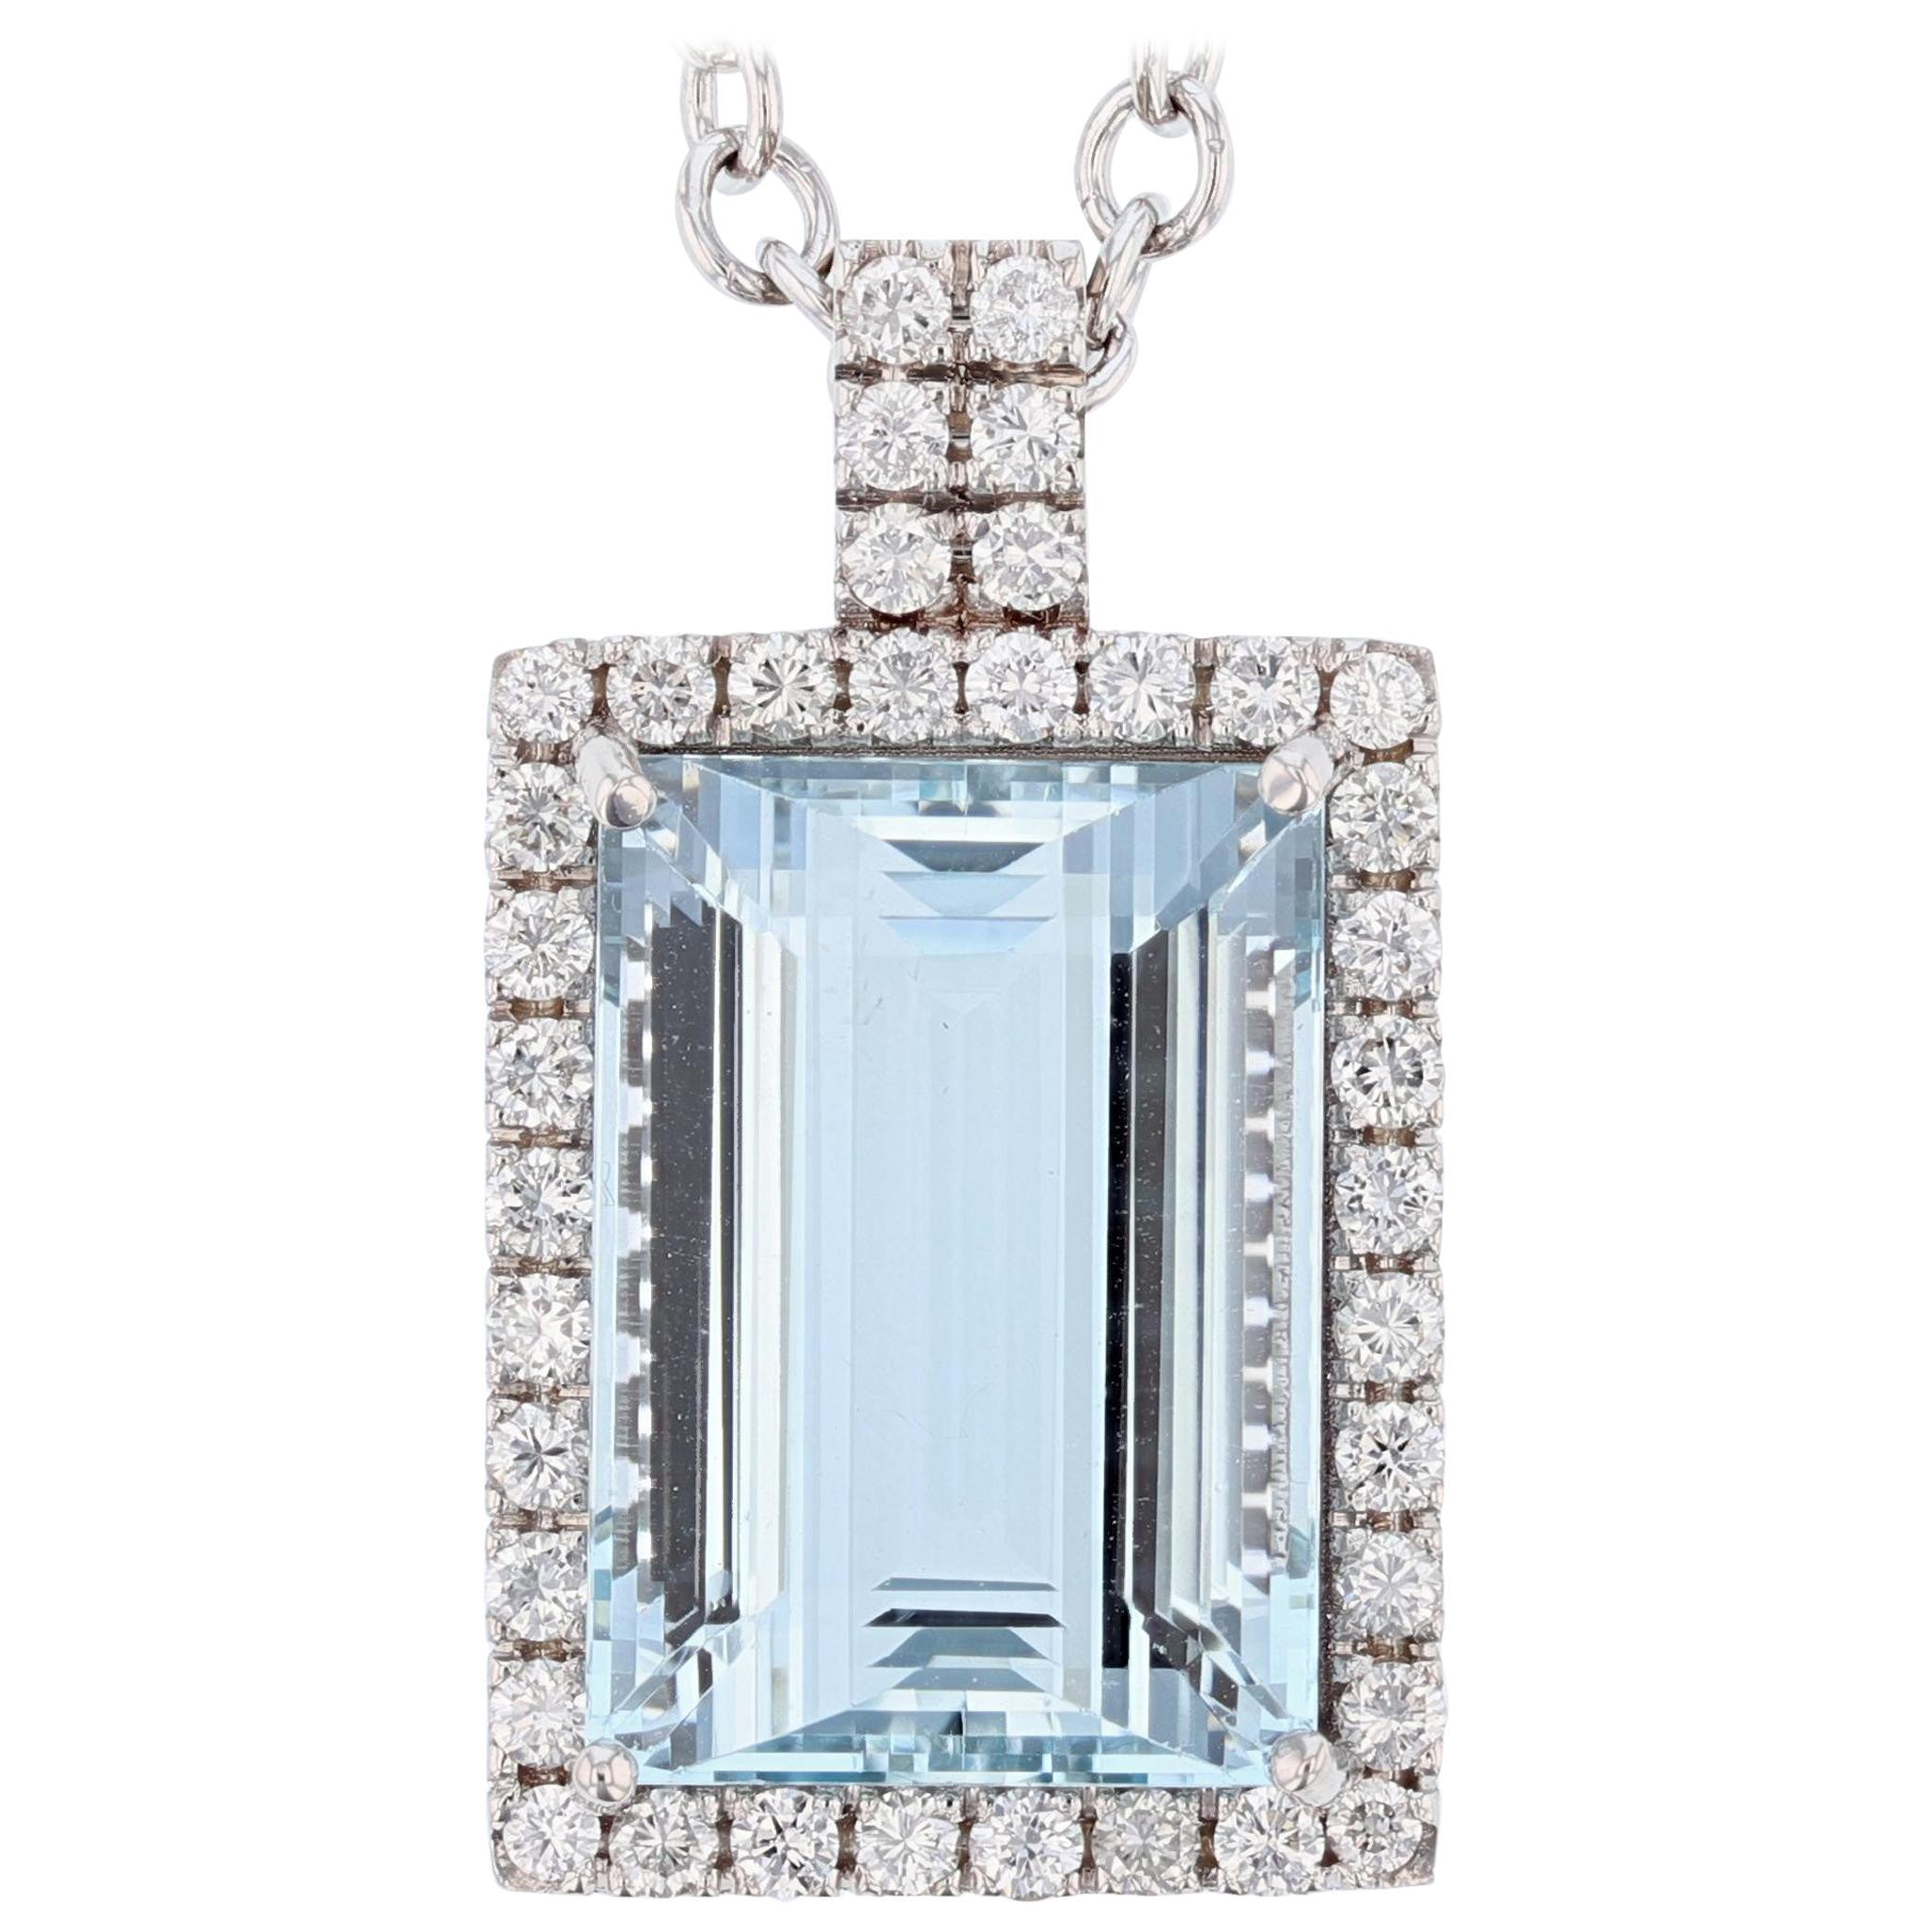 14 Karat White Gold 31.51 Carat Aquamarine and Diamond Pendant Necklace